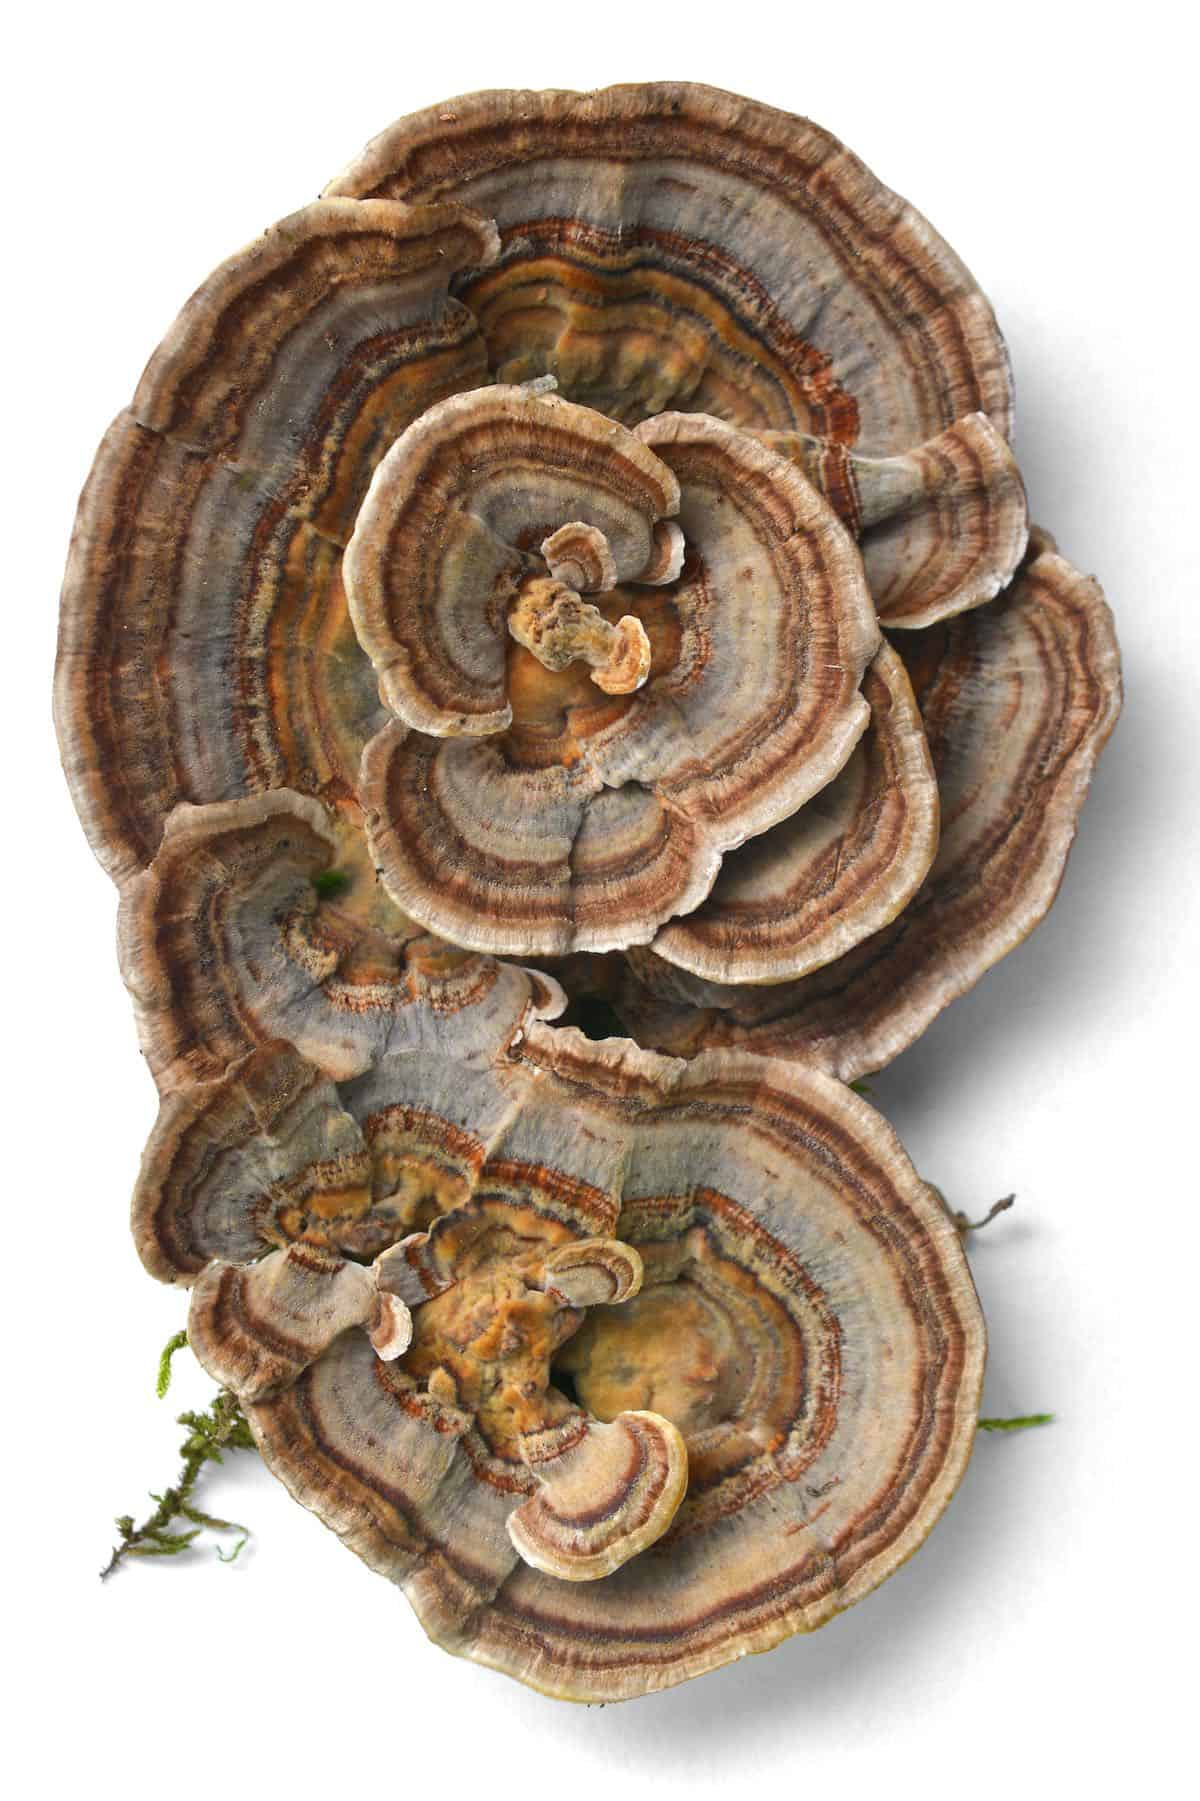 Turkey tails mushroom on a white background